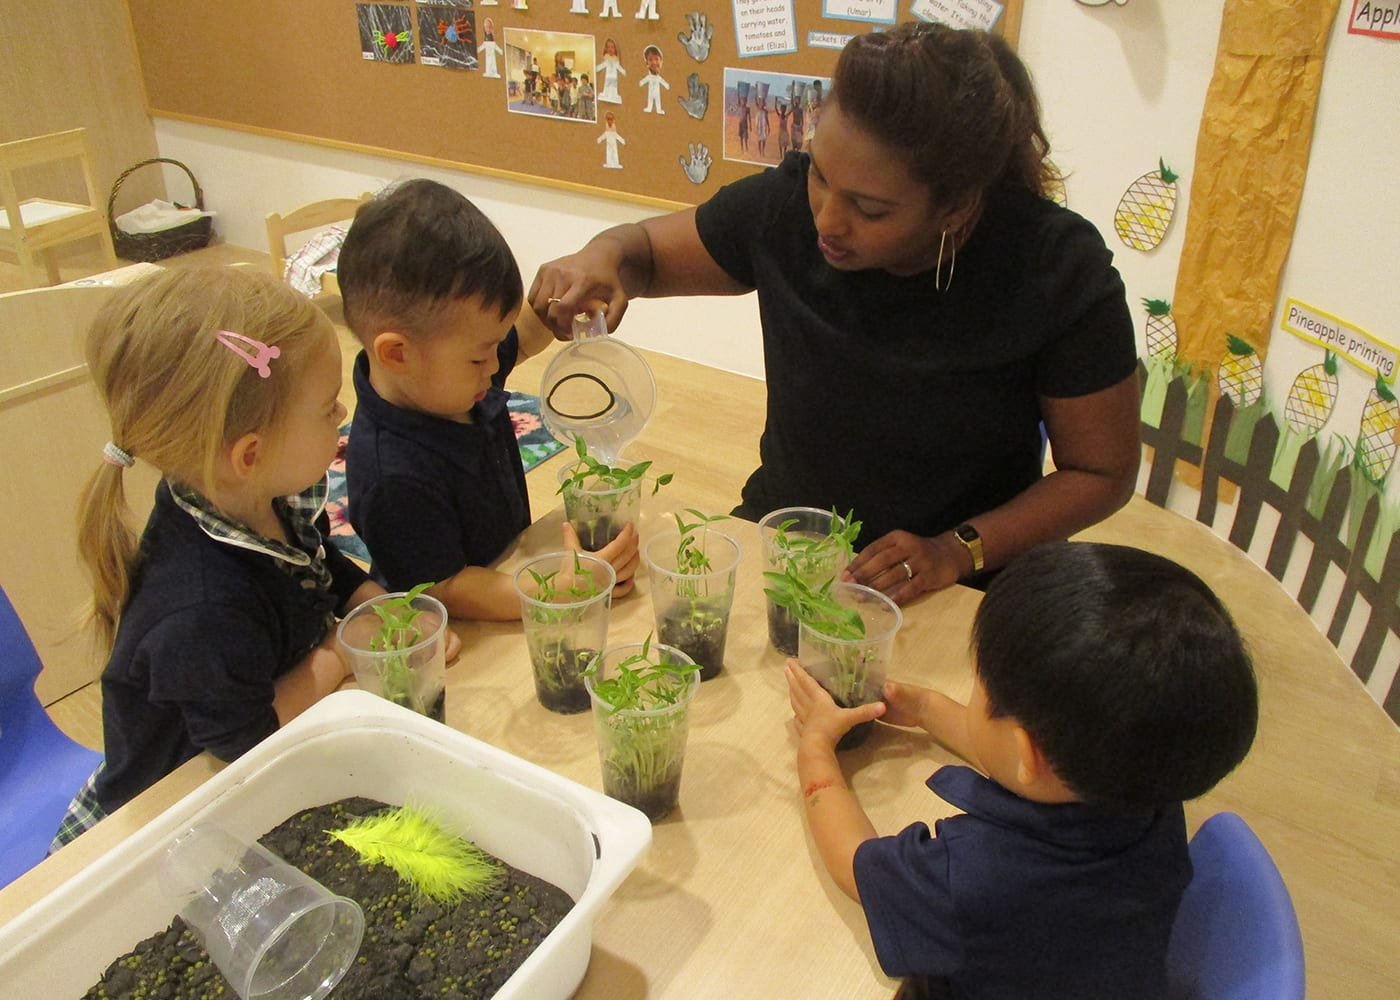 Repton Schoolhouse | Is preschool really worth it?